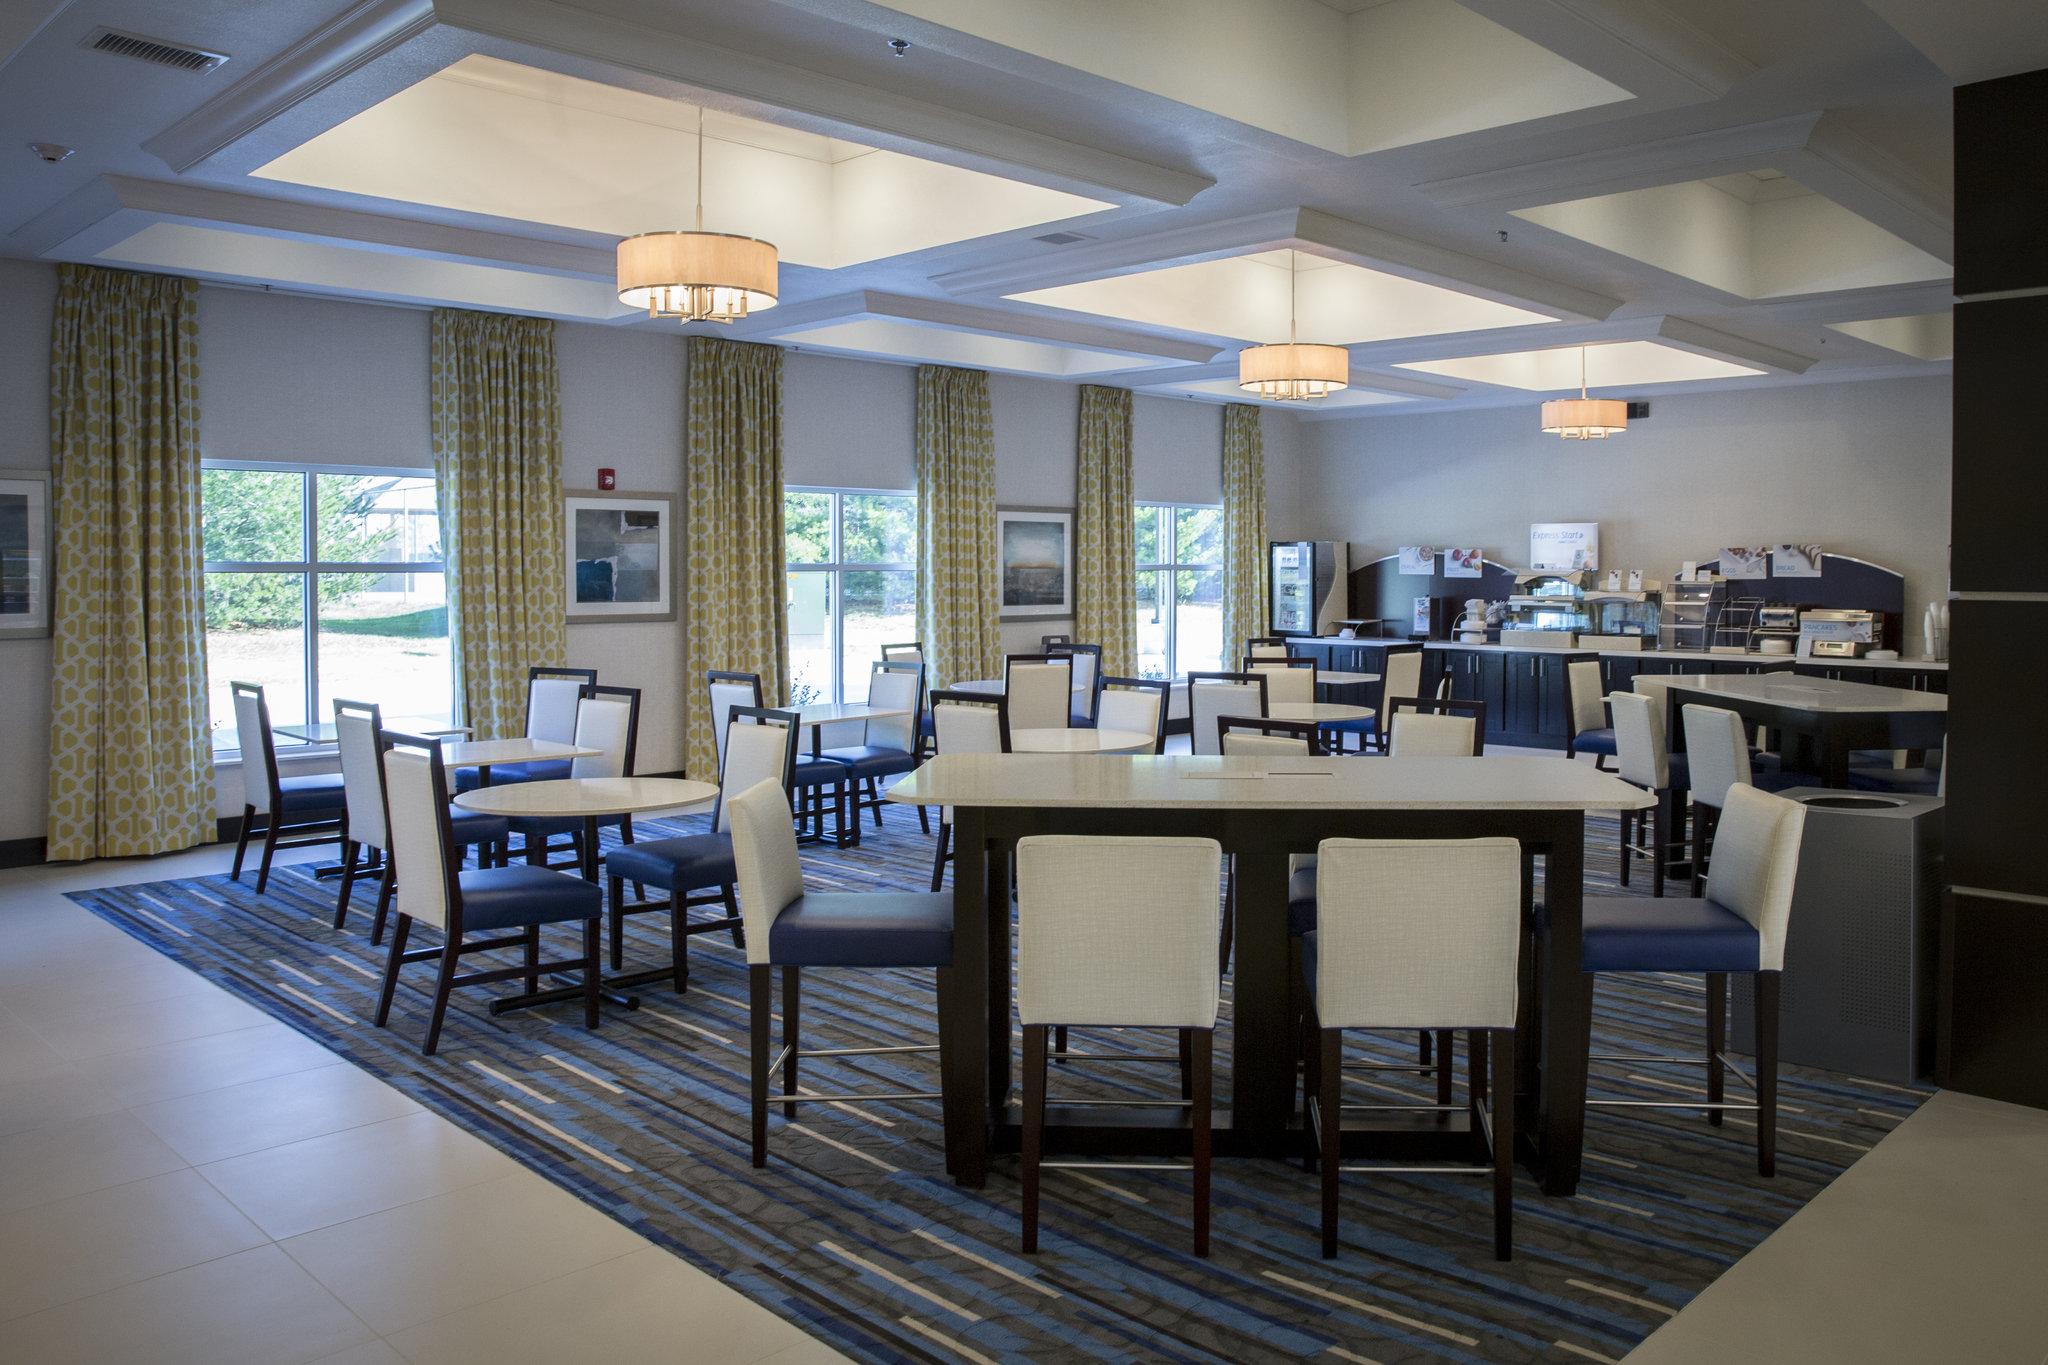 Holiday Inn Express & Stes Edwardsville